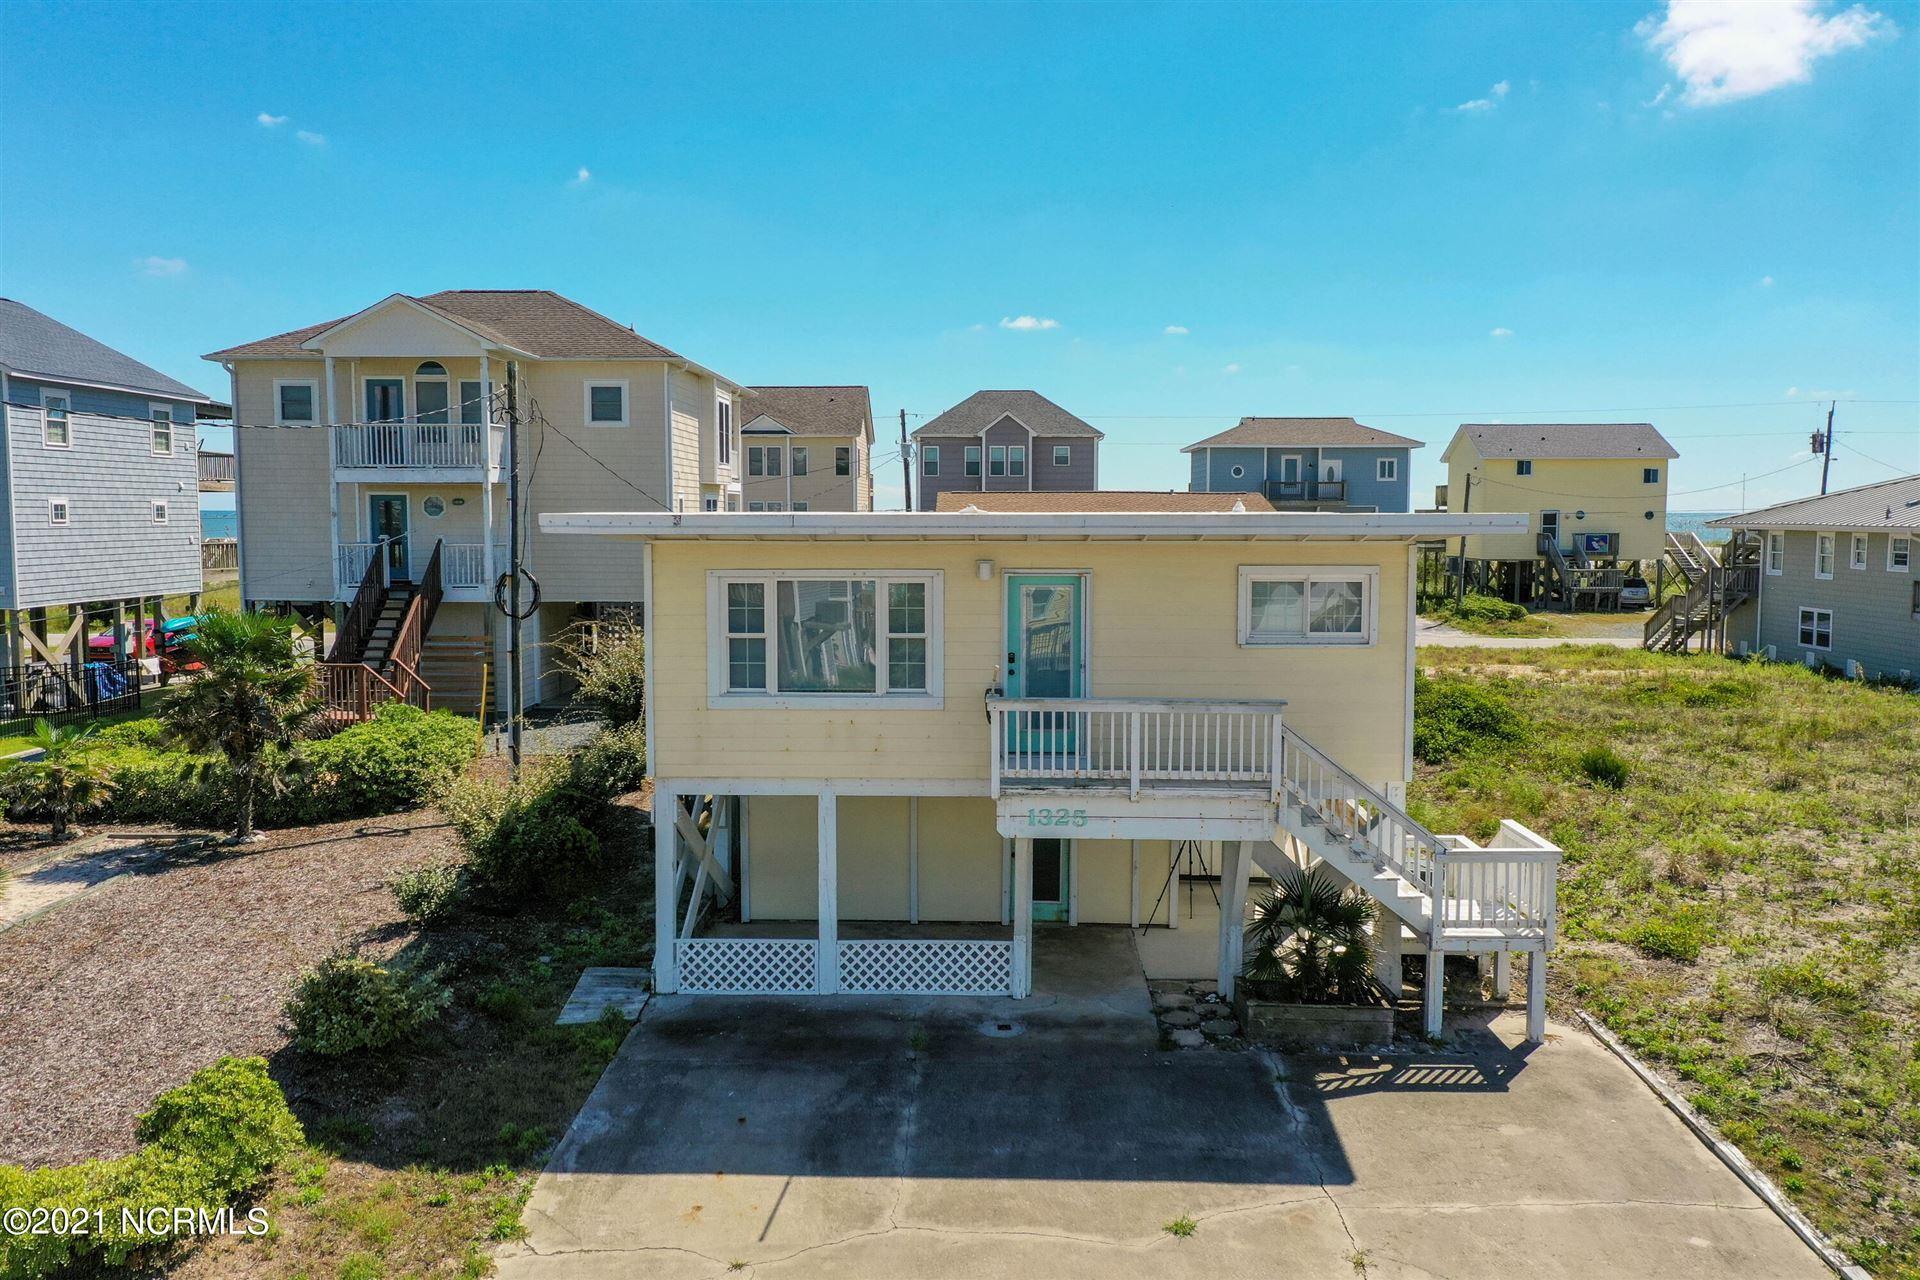 Photo of 1325 S Anderson Boulevard, Topsail Beach, NC 28445 (MLS # 100292116)